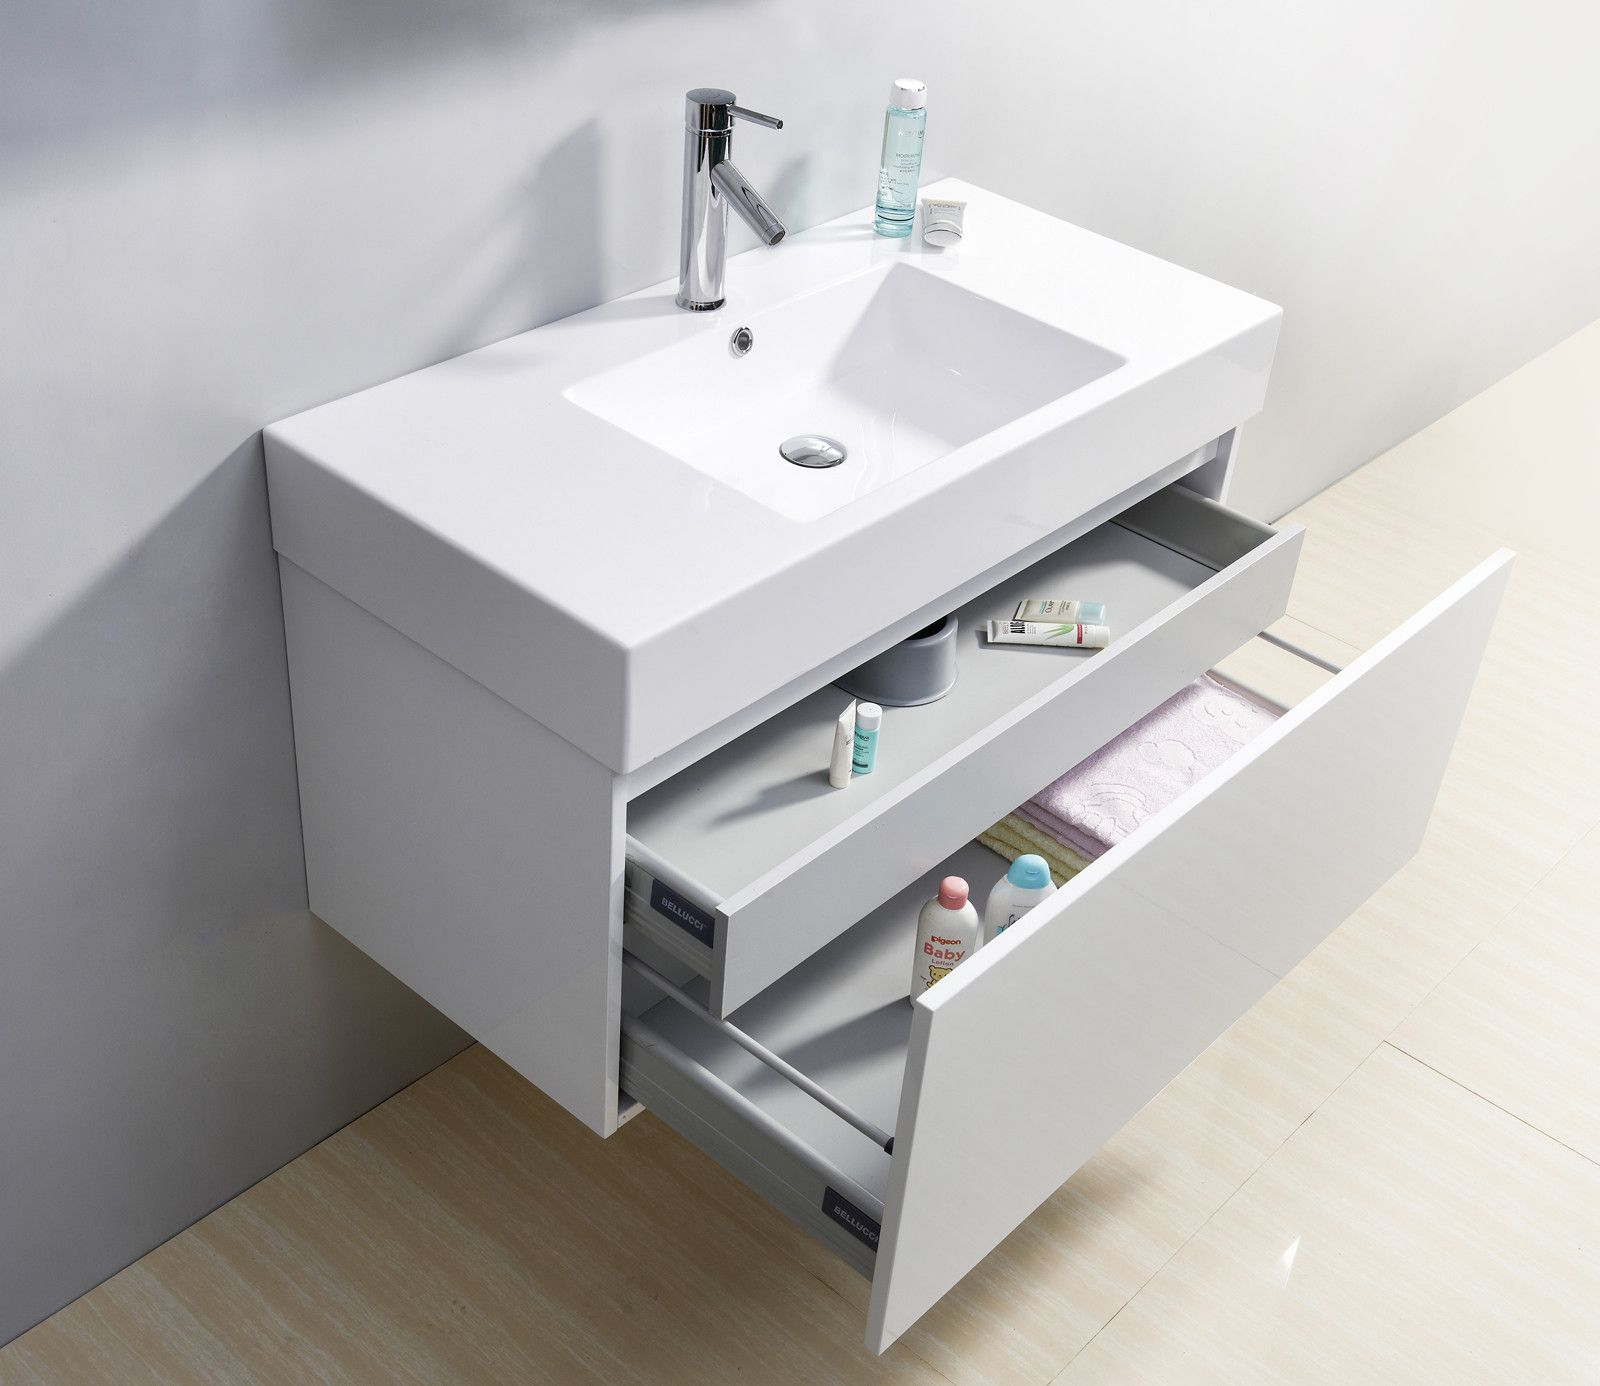 39 Glossy White Modern Floating Single Sink Bathroom Vanity